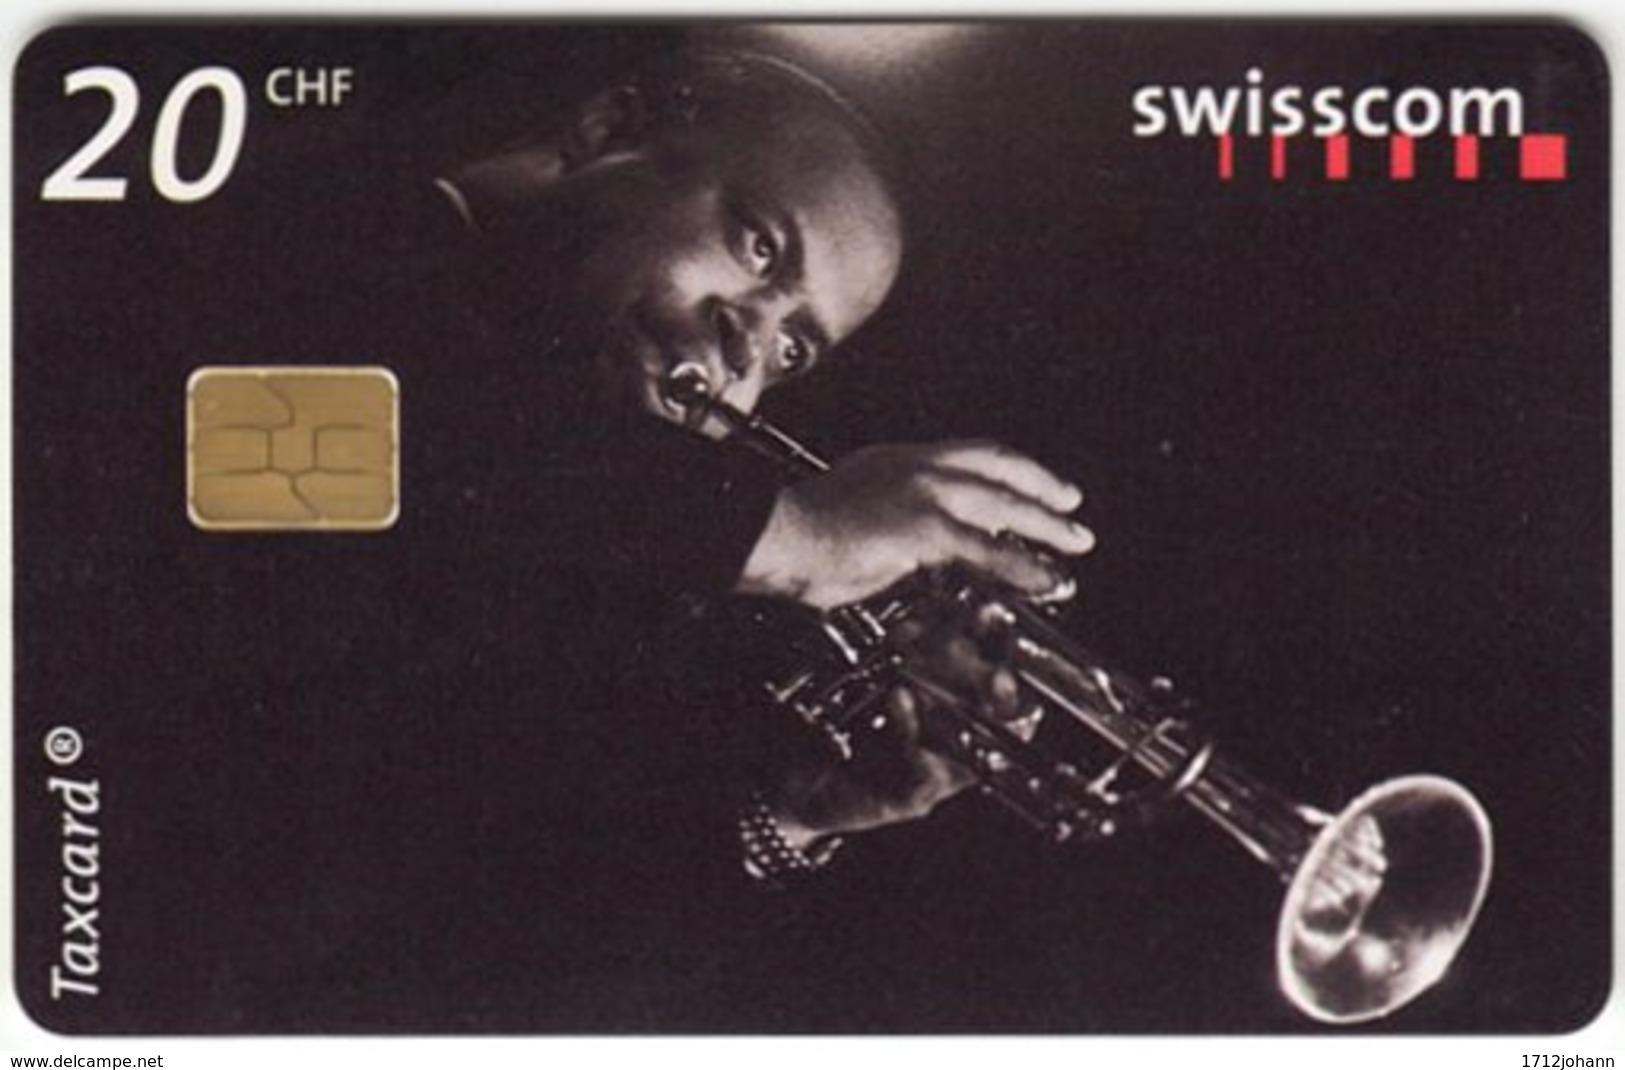 SWITZERLAND C-233 Chip Swisscom - Musician, Jazz - Used - Suisse